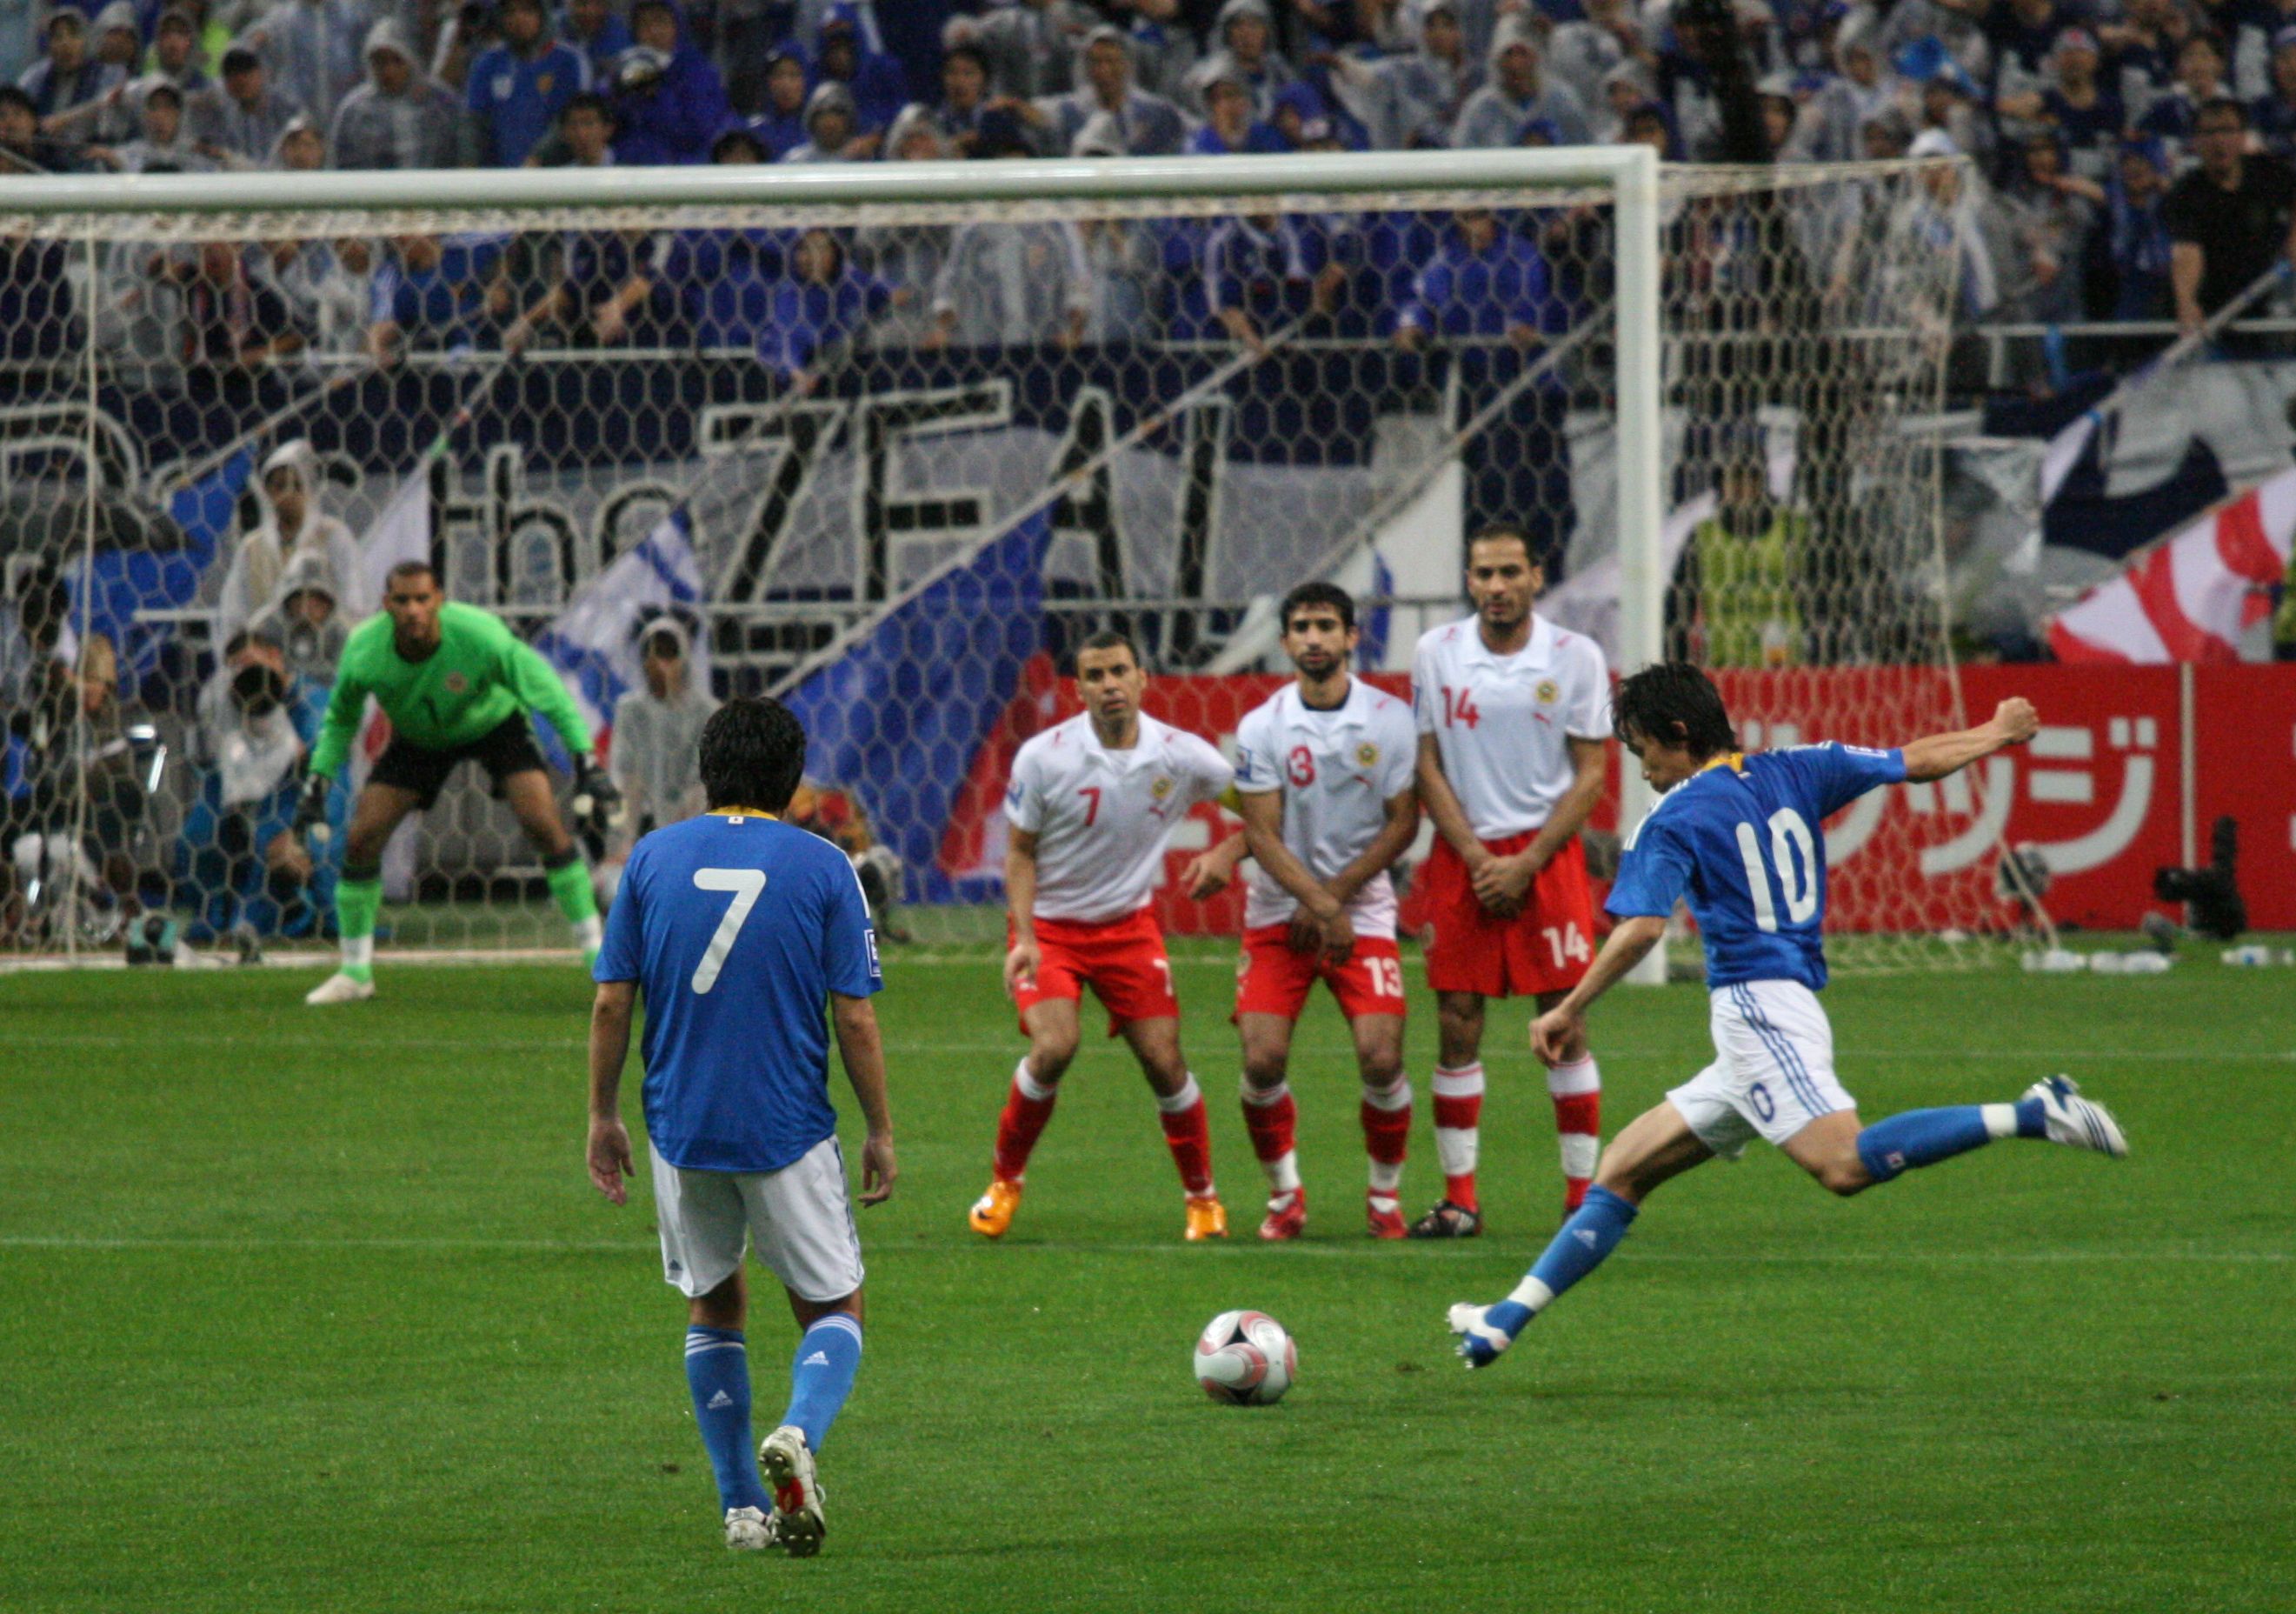 Shunsuke Nakamura taking a free kick